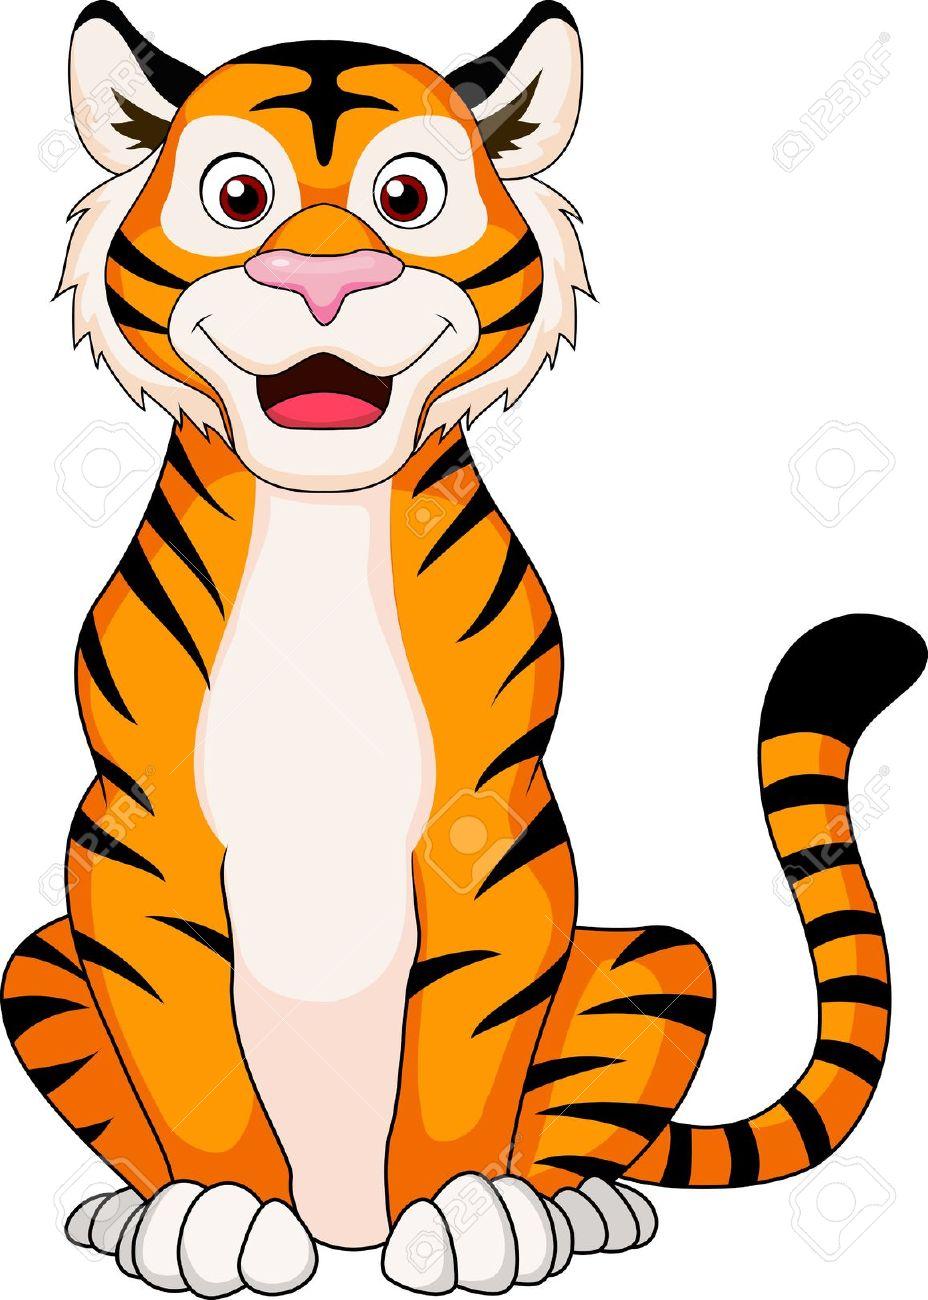 6+ Cute Tiger Clipart.